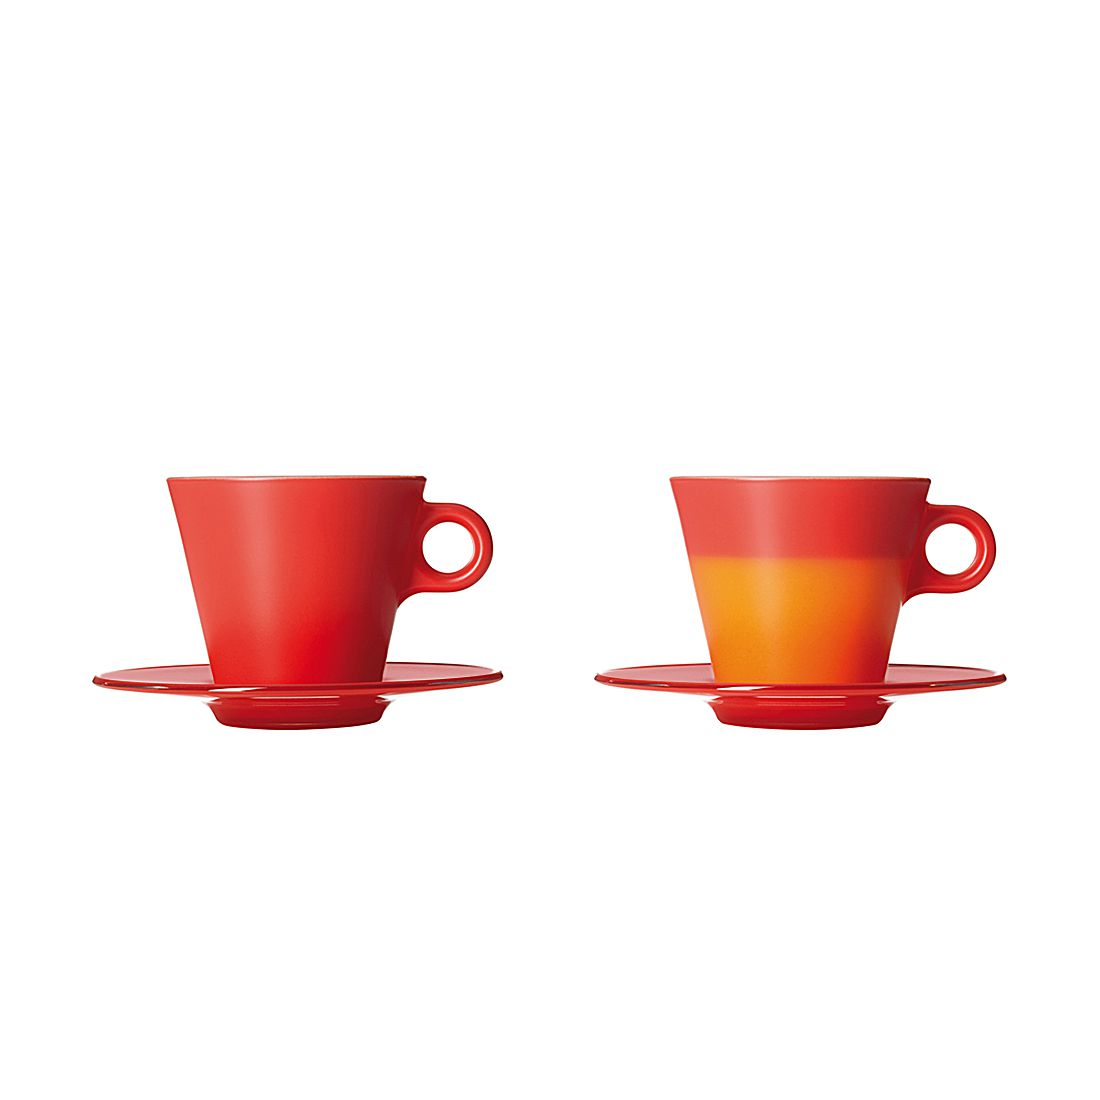 Cappuccinotassen Ooh Magico (2er-Set) – Rot, Leonardo jetzt bestellen